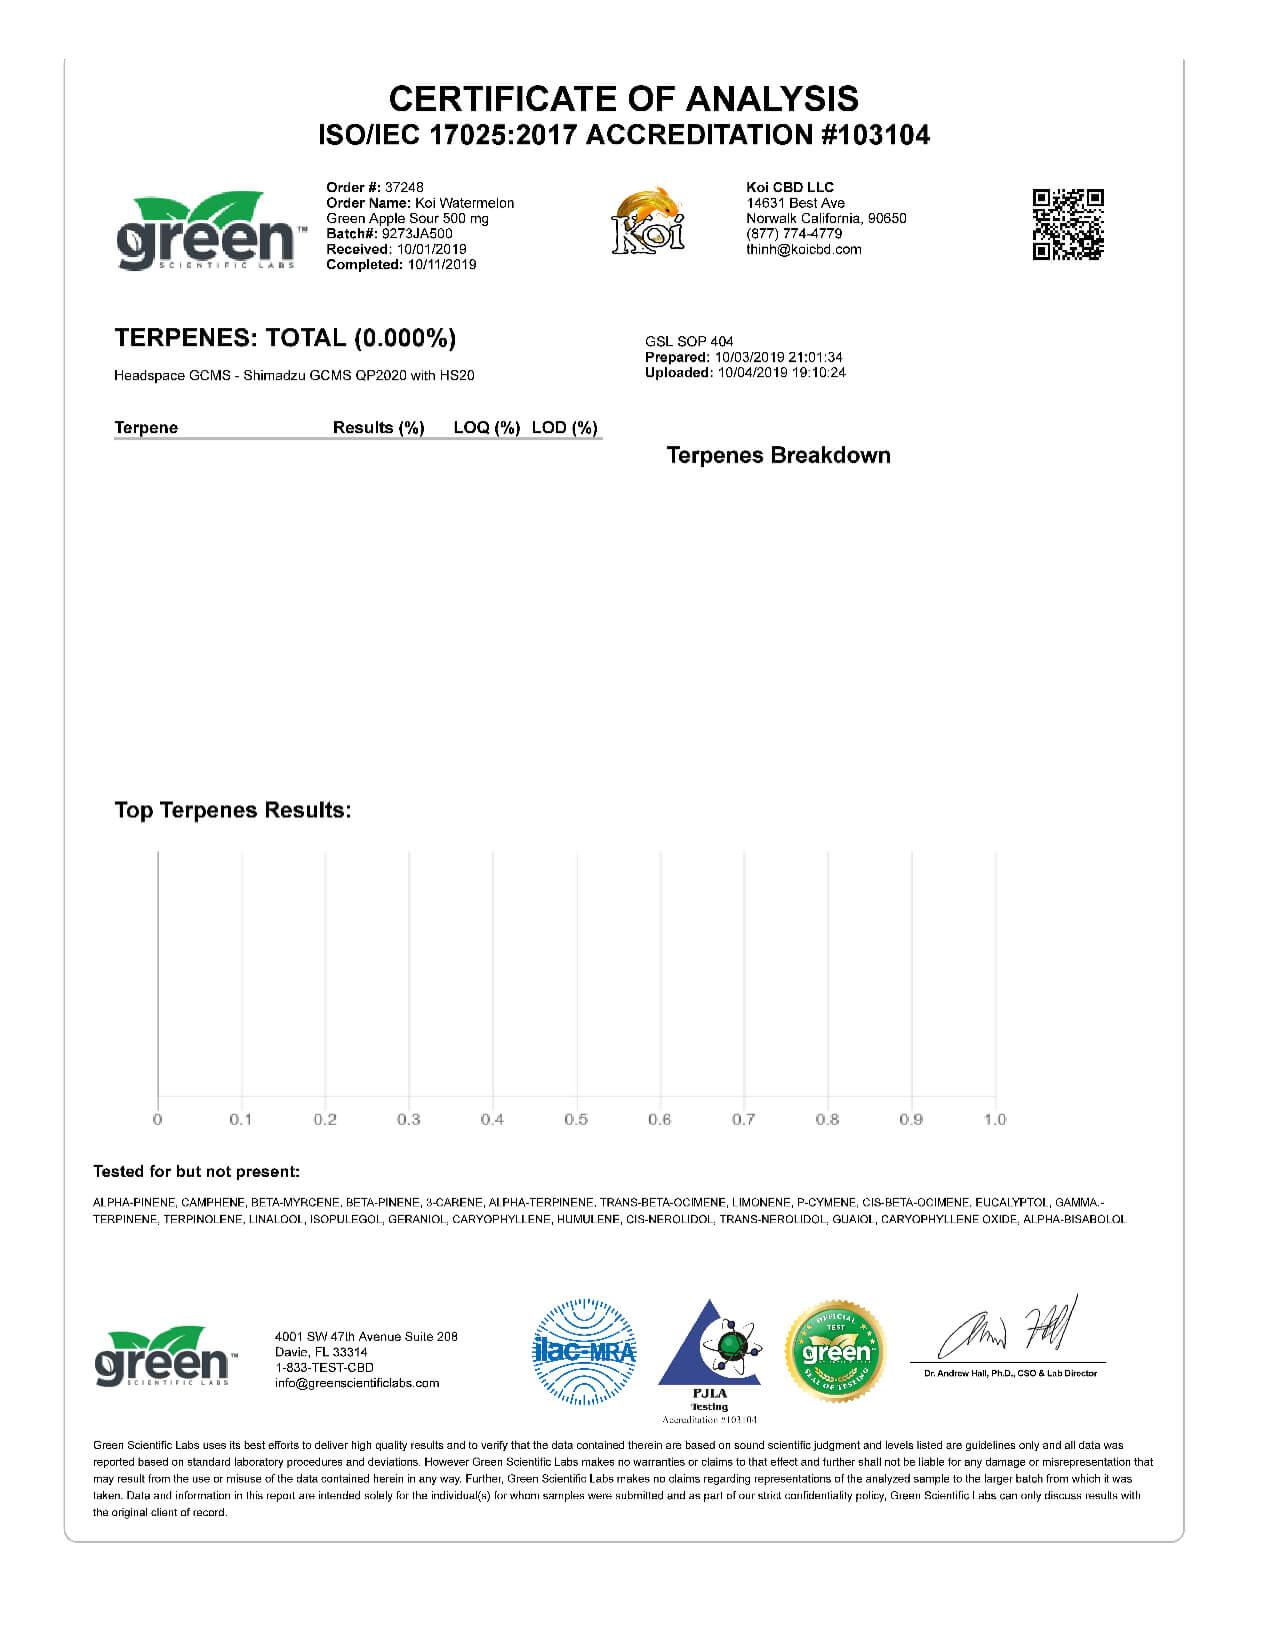 Koi CBD Watermelon Green Apple Sour Vape Oil 500mg page2